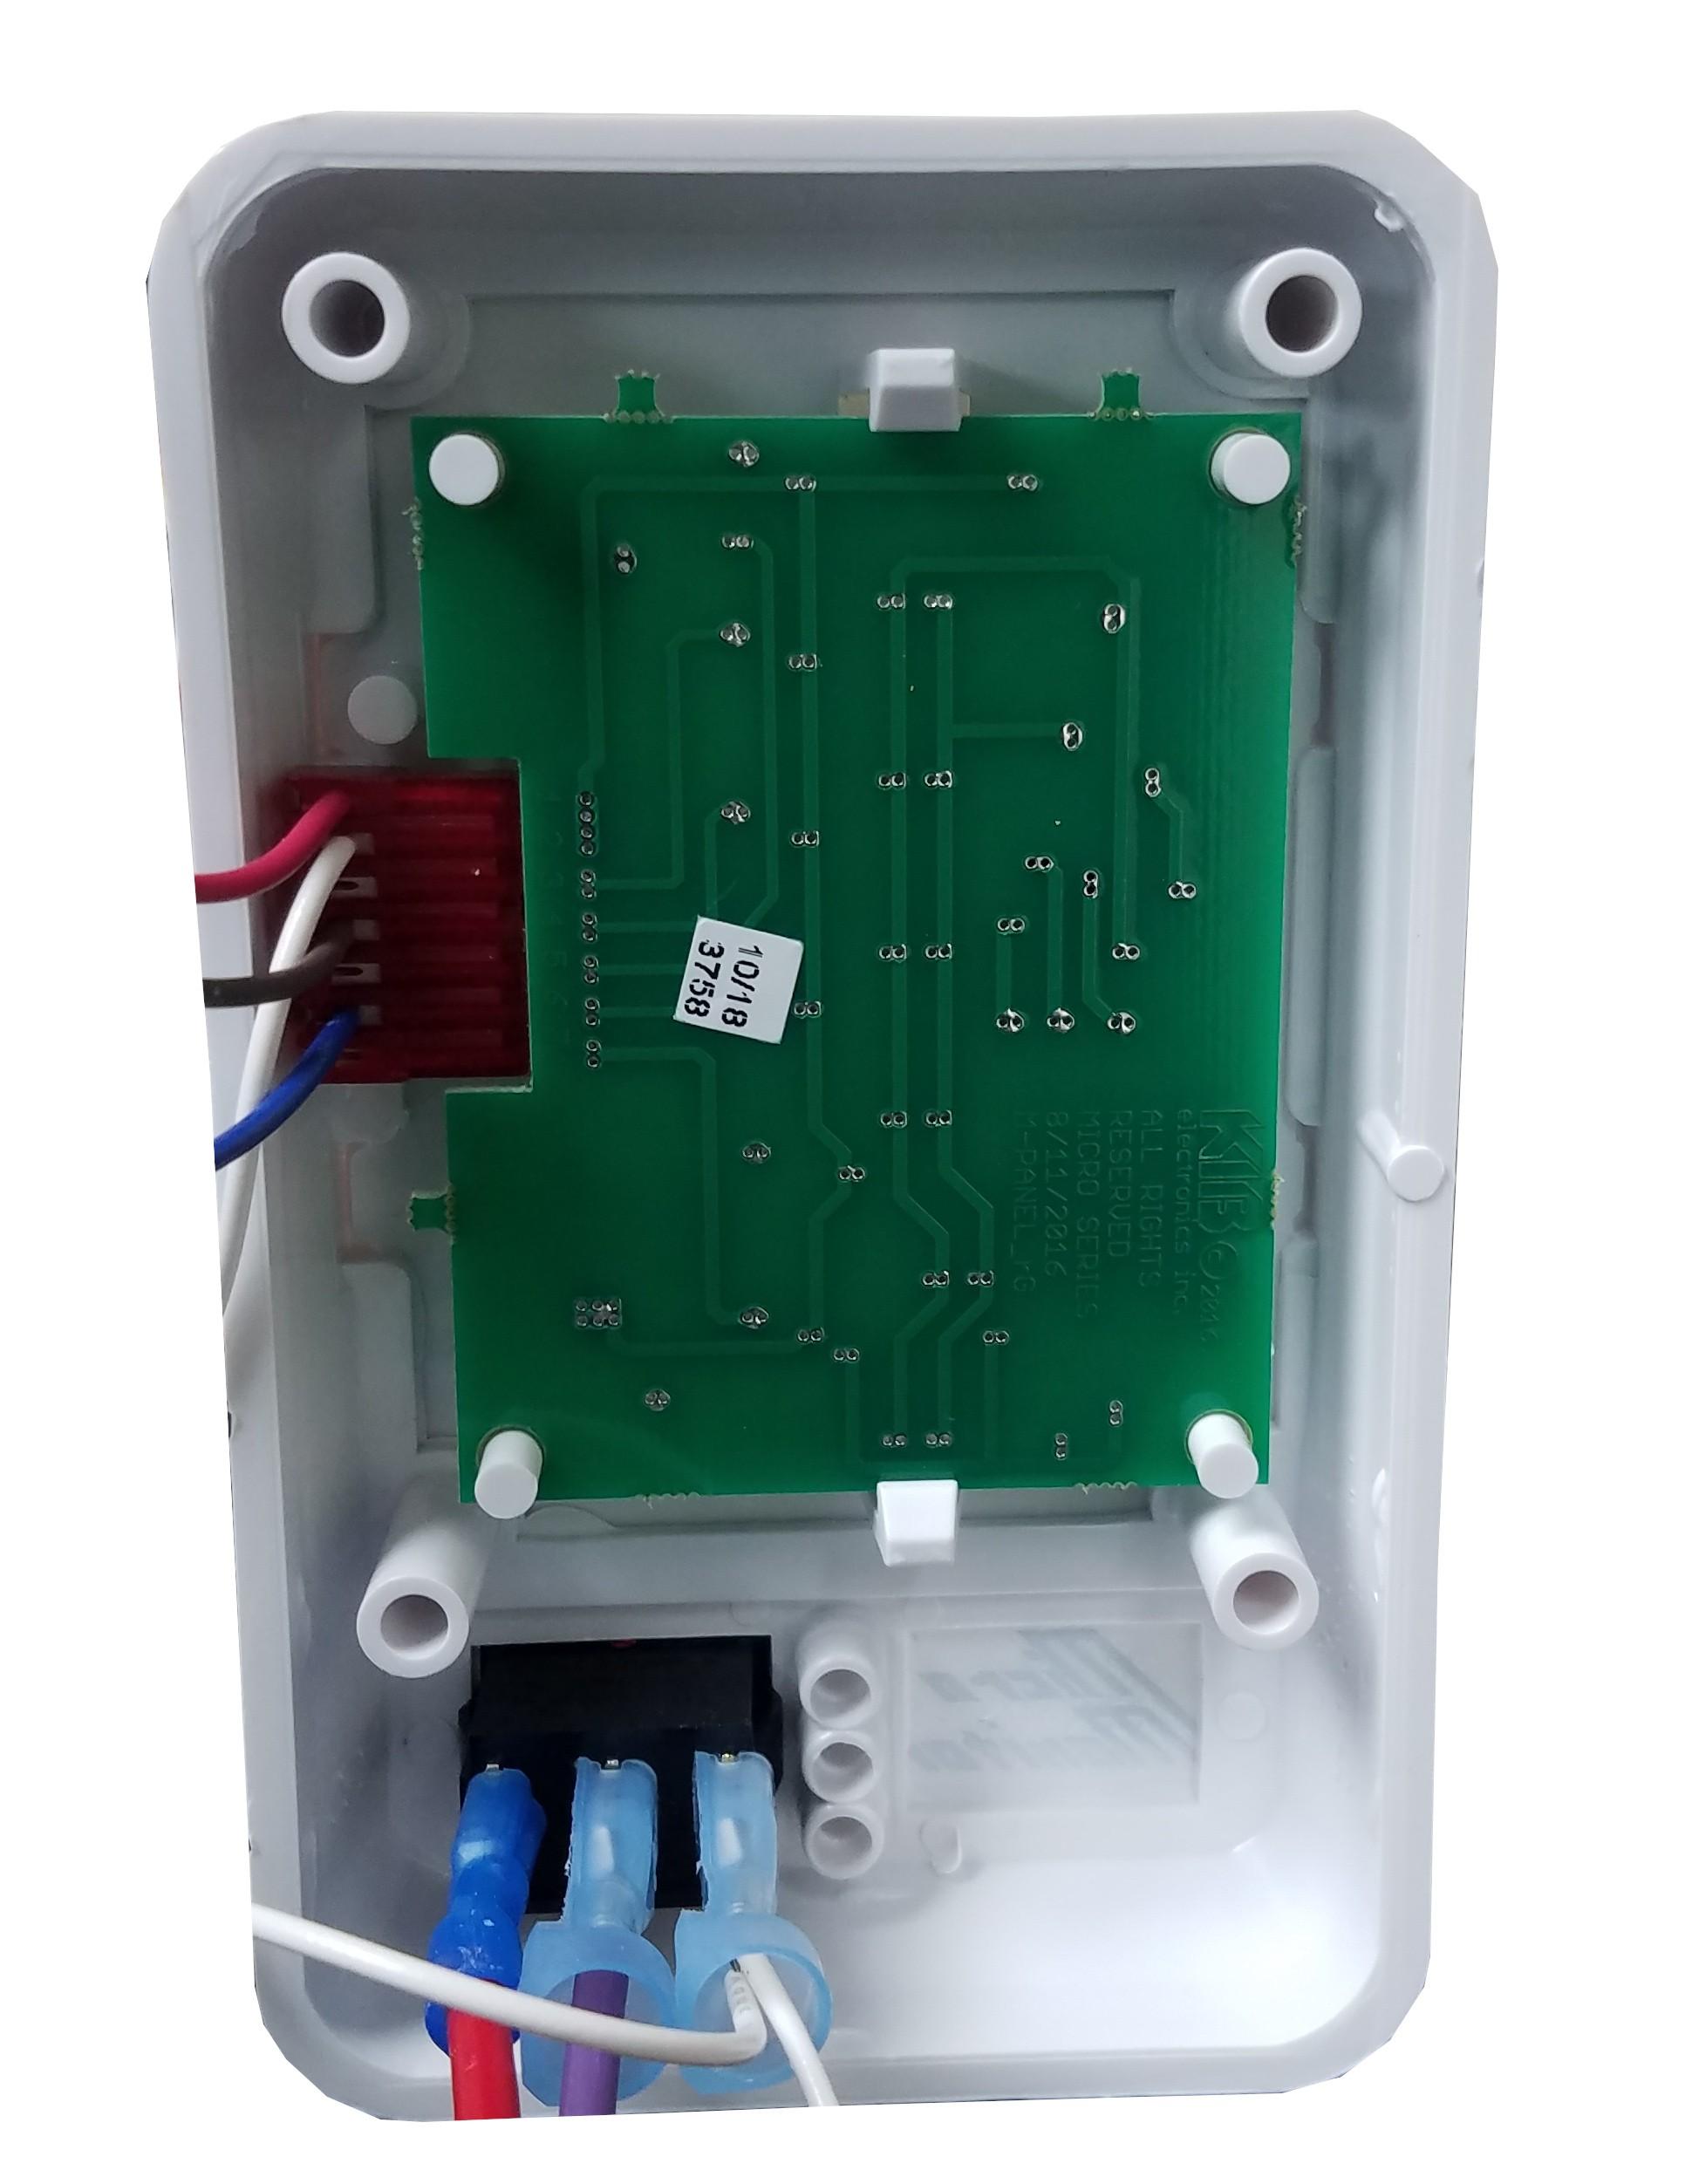 kib 2 tank monitor panel 12 volt white face plate class a customs